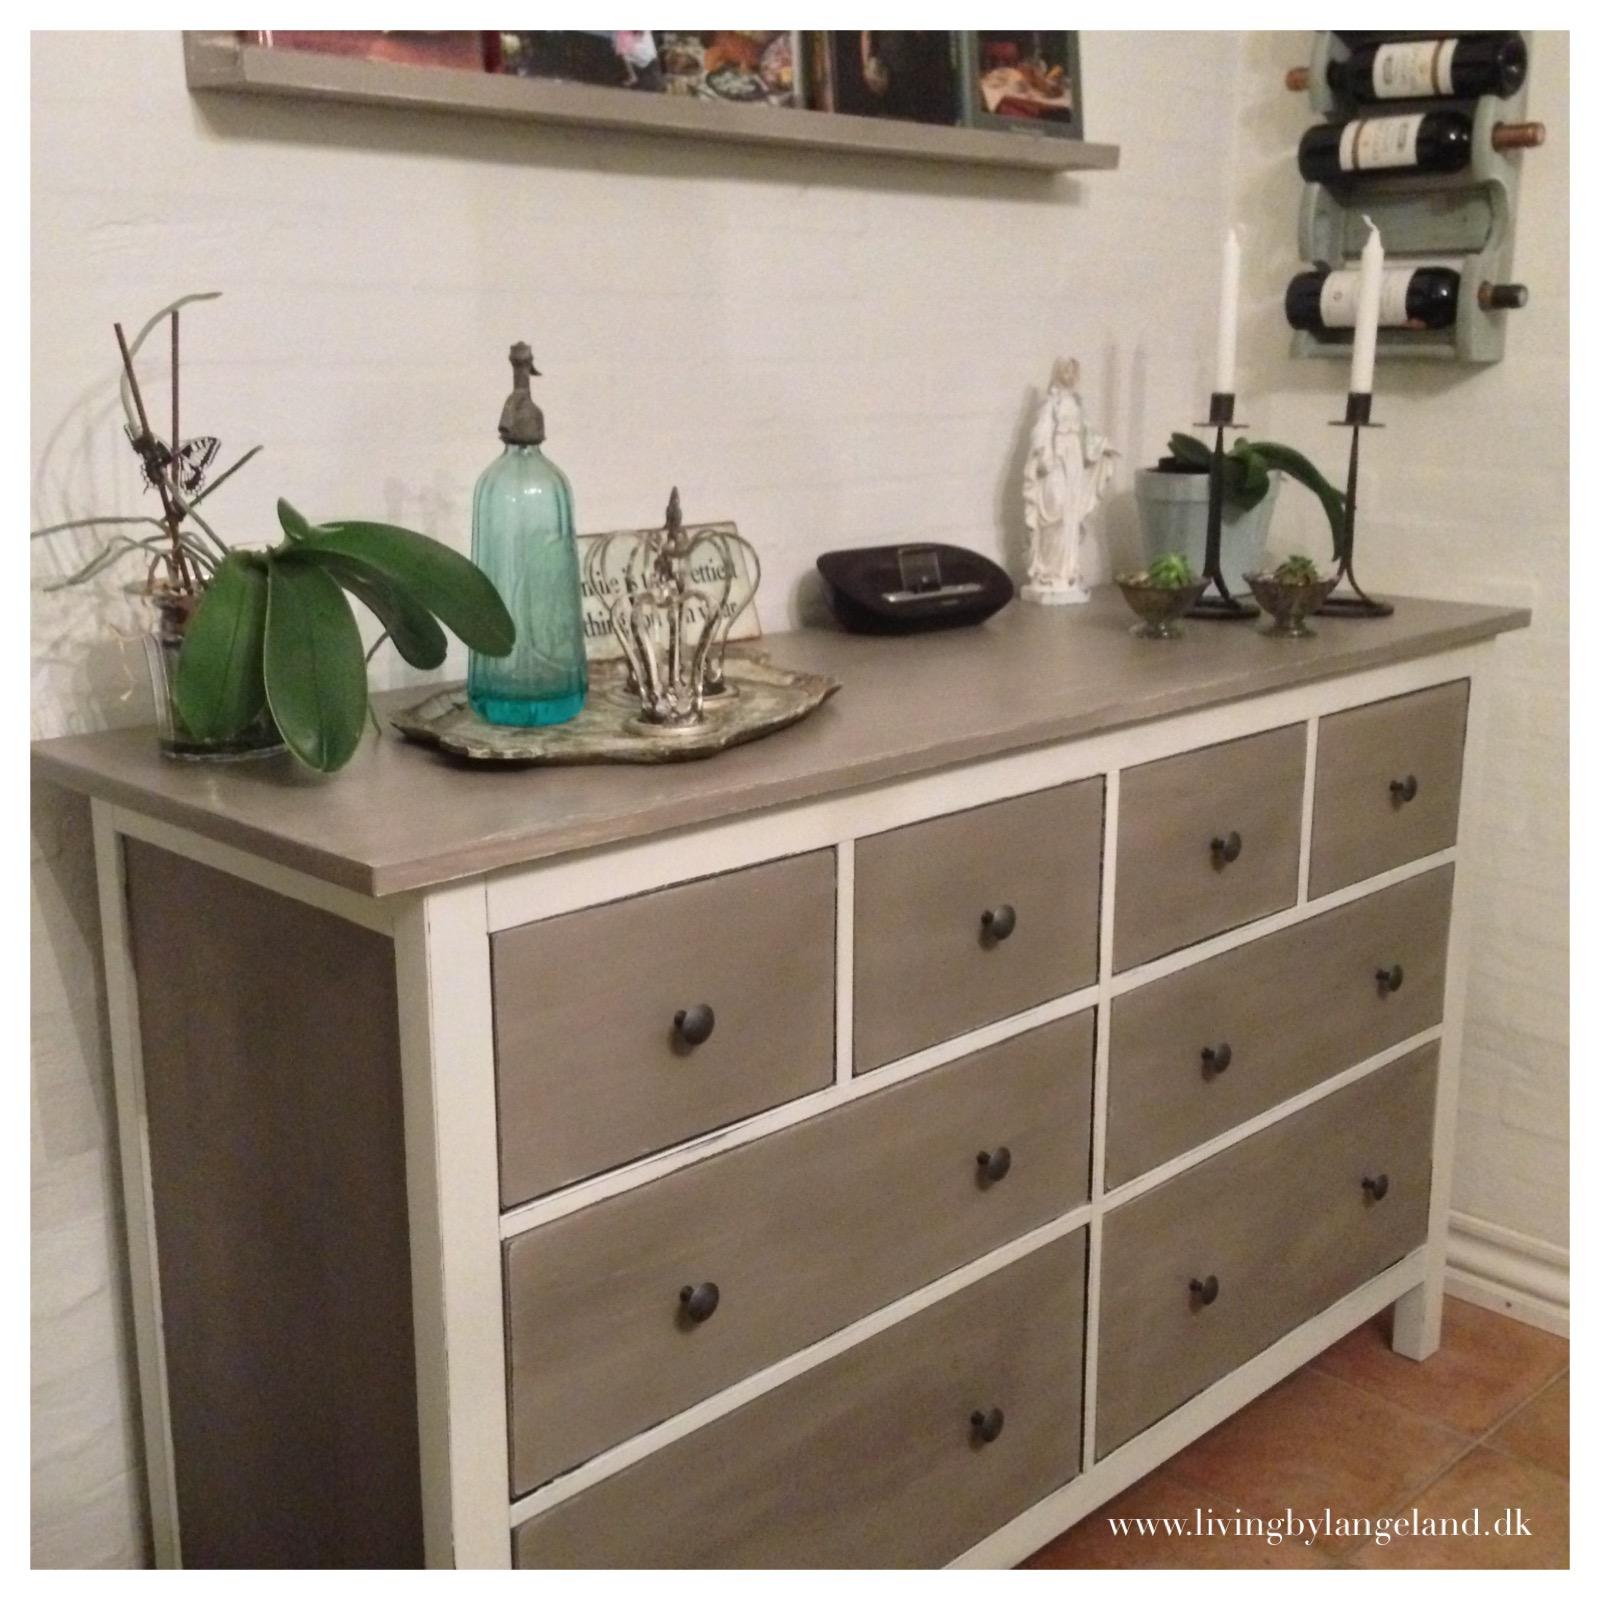 annie sloan chalk paint french linen. Black Bedroom Furniture Sets. Home Design Ideas